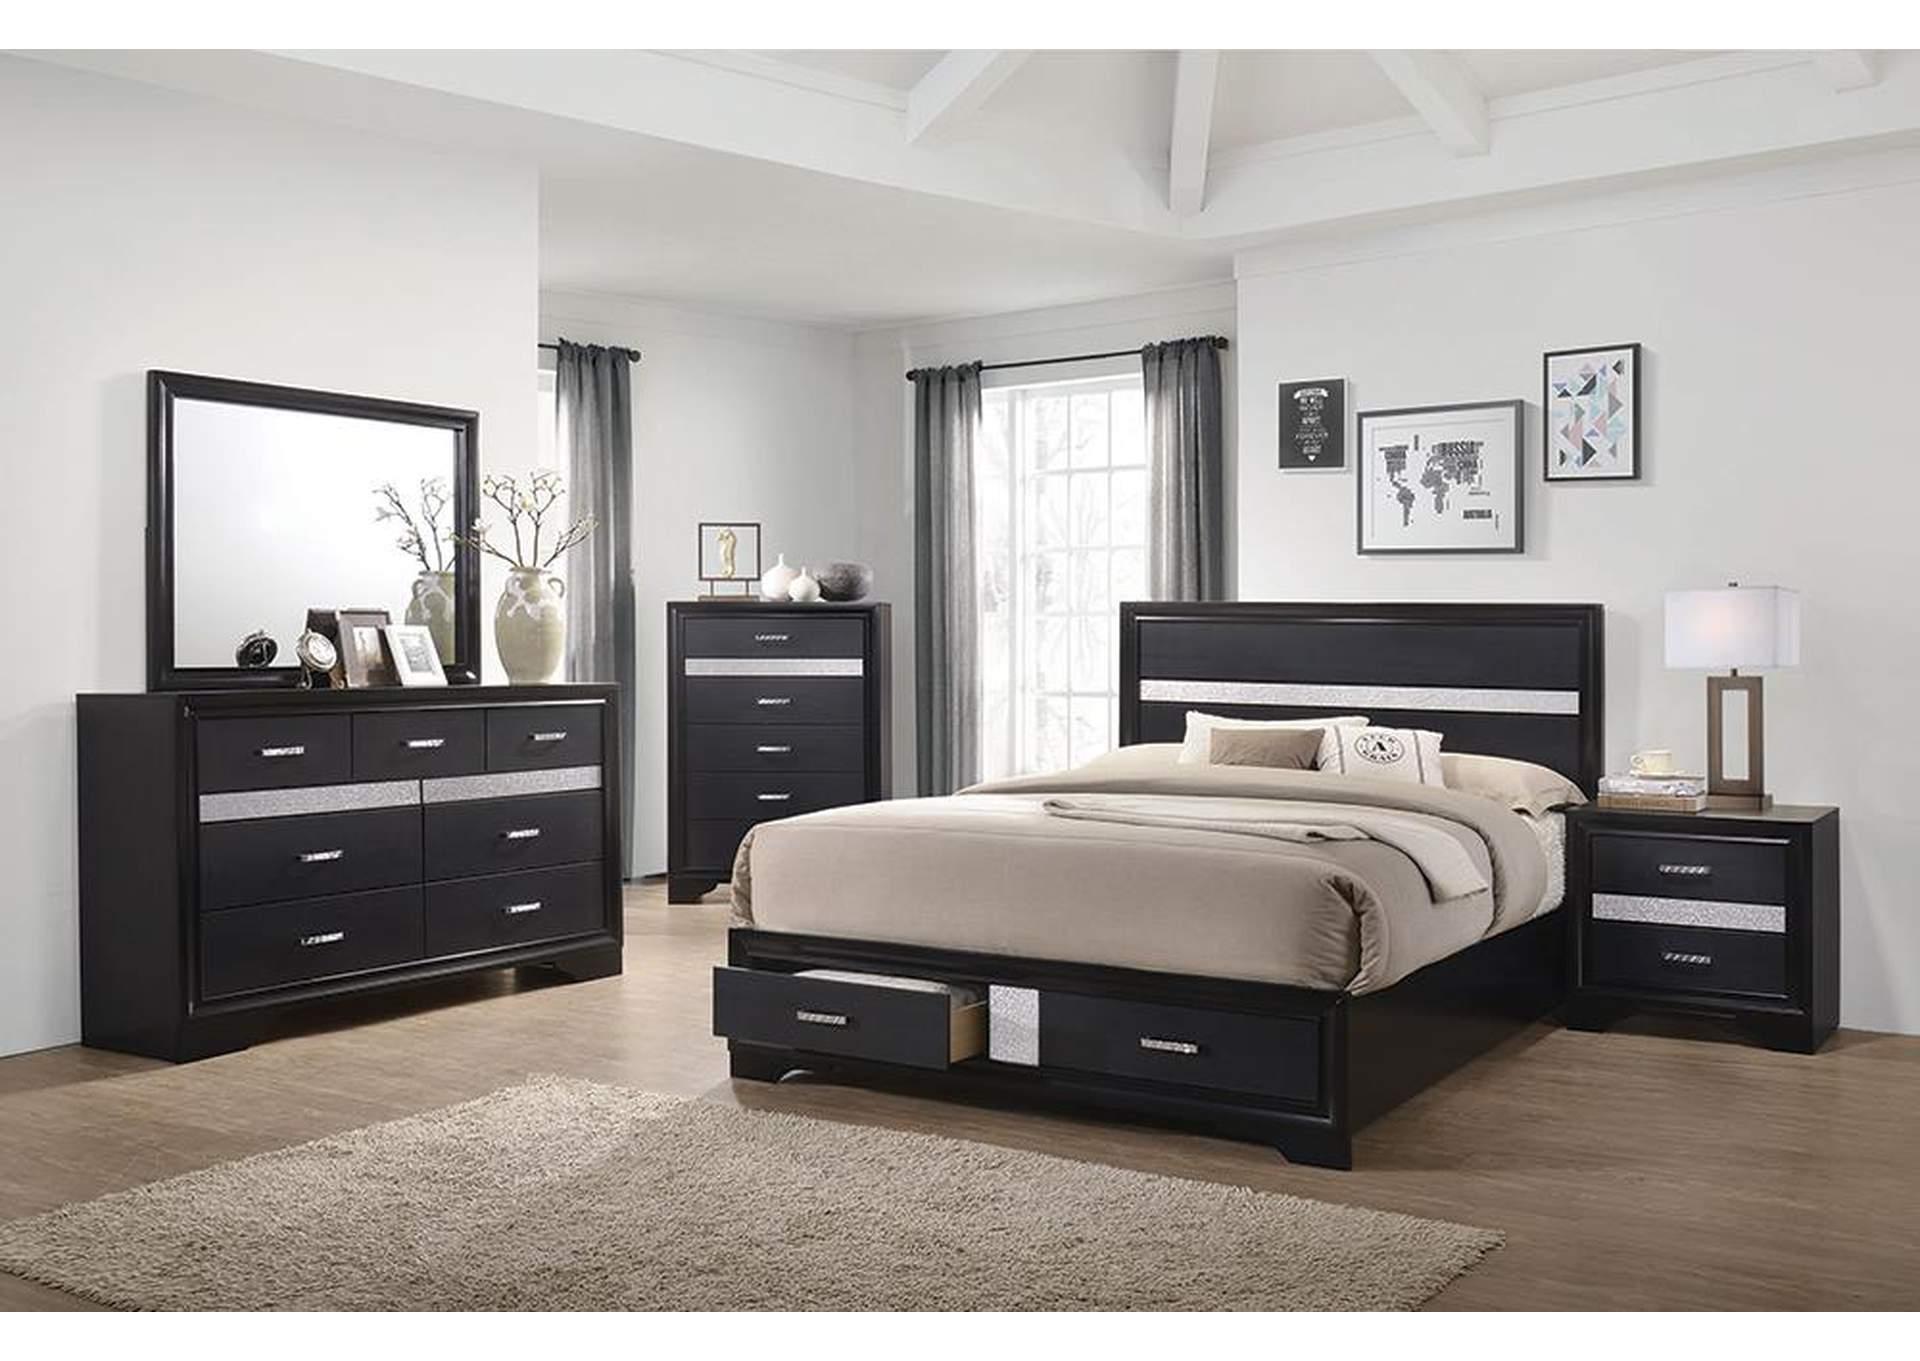 Miranda Black California King Storage Bed W Dresser Mirror Big Box Furniture Discount Furniture Stores In Miami Florida